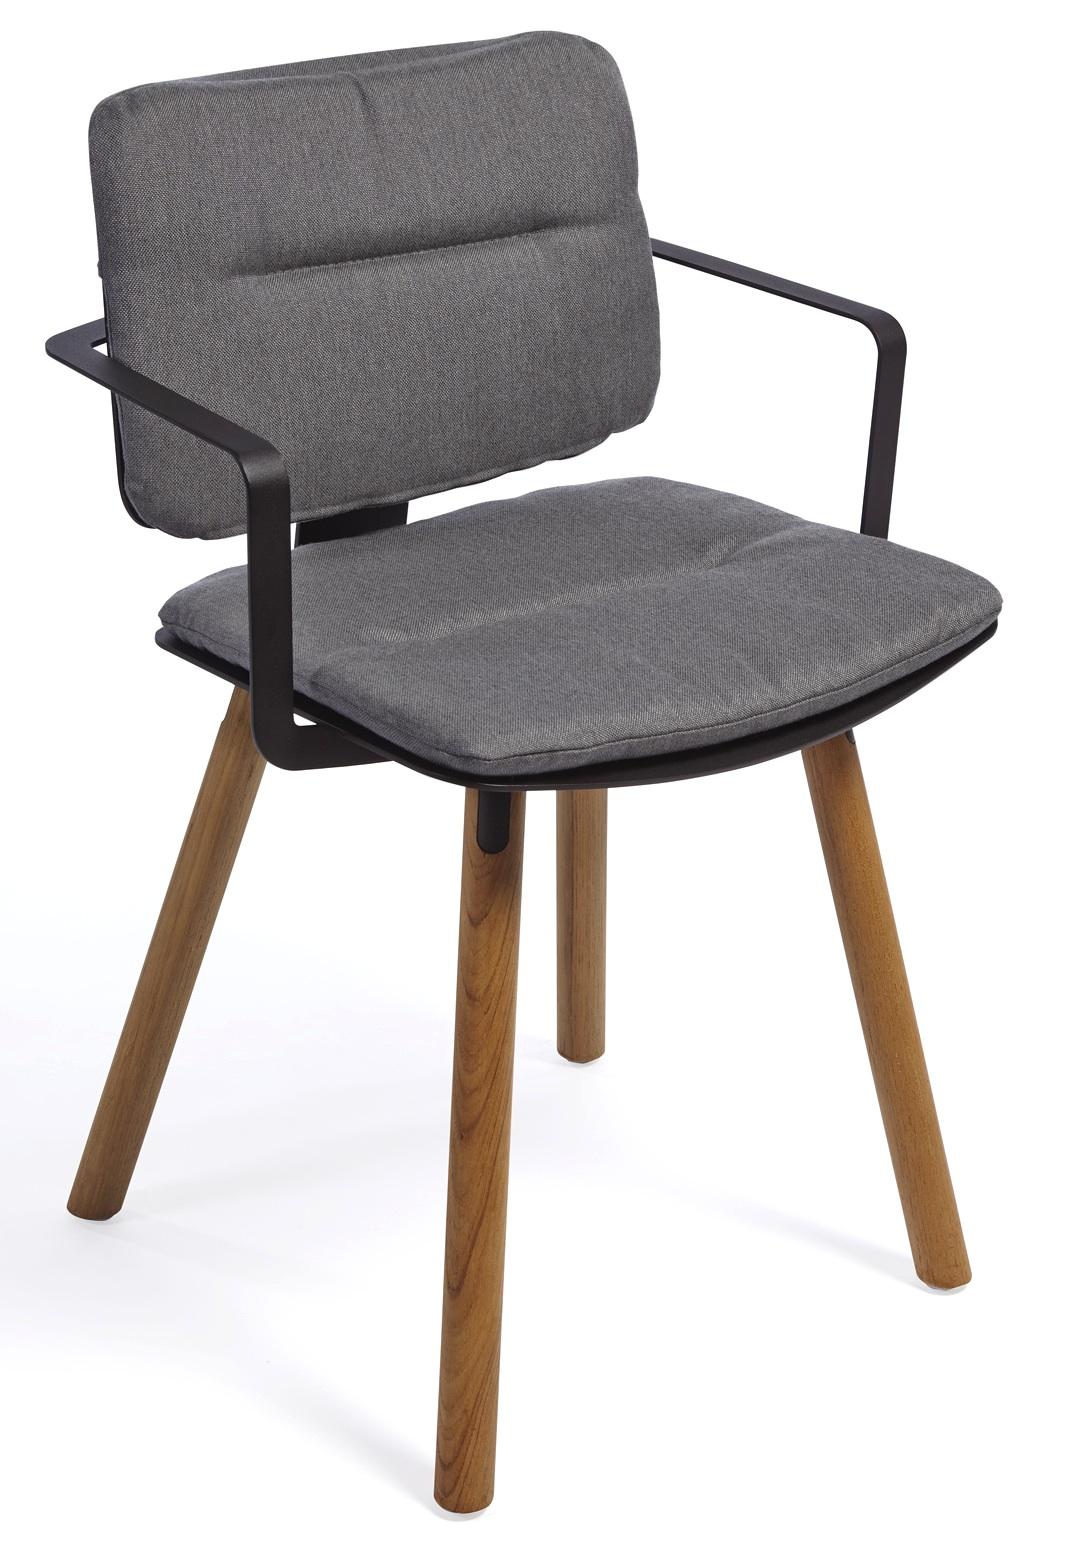 coco stuhl ohne armlehne teak alu mazuvo gartenm bel. Black Bedroom Furniture Sets. Home Design Ideas